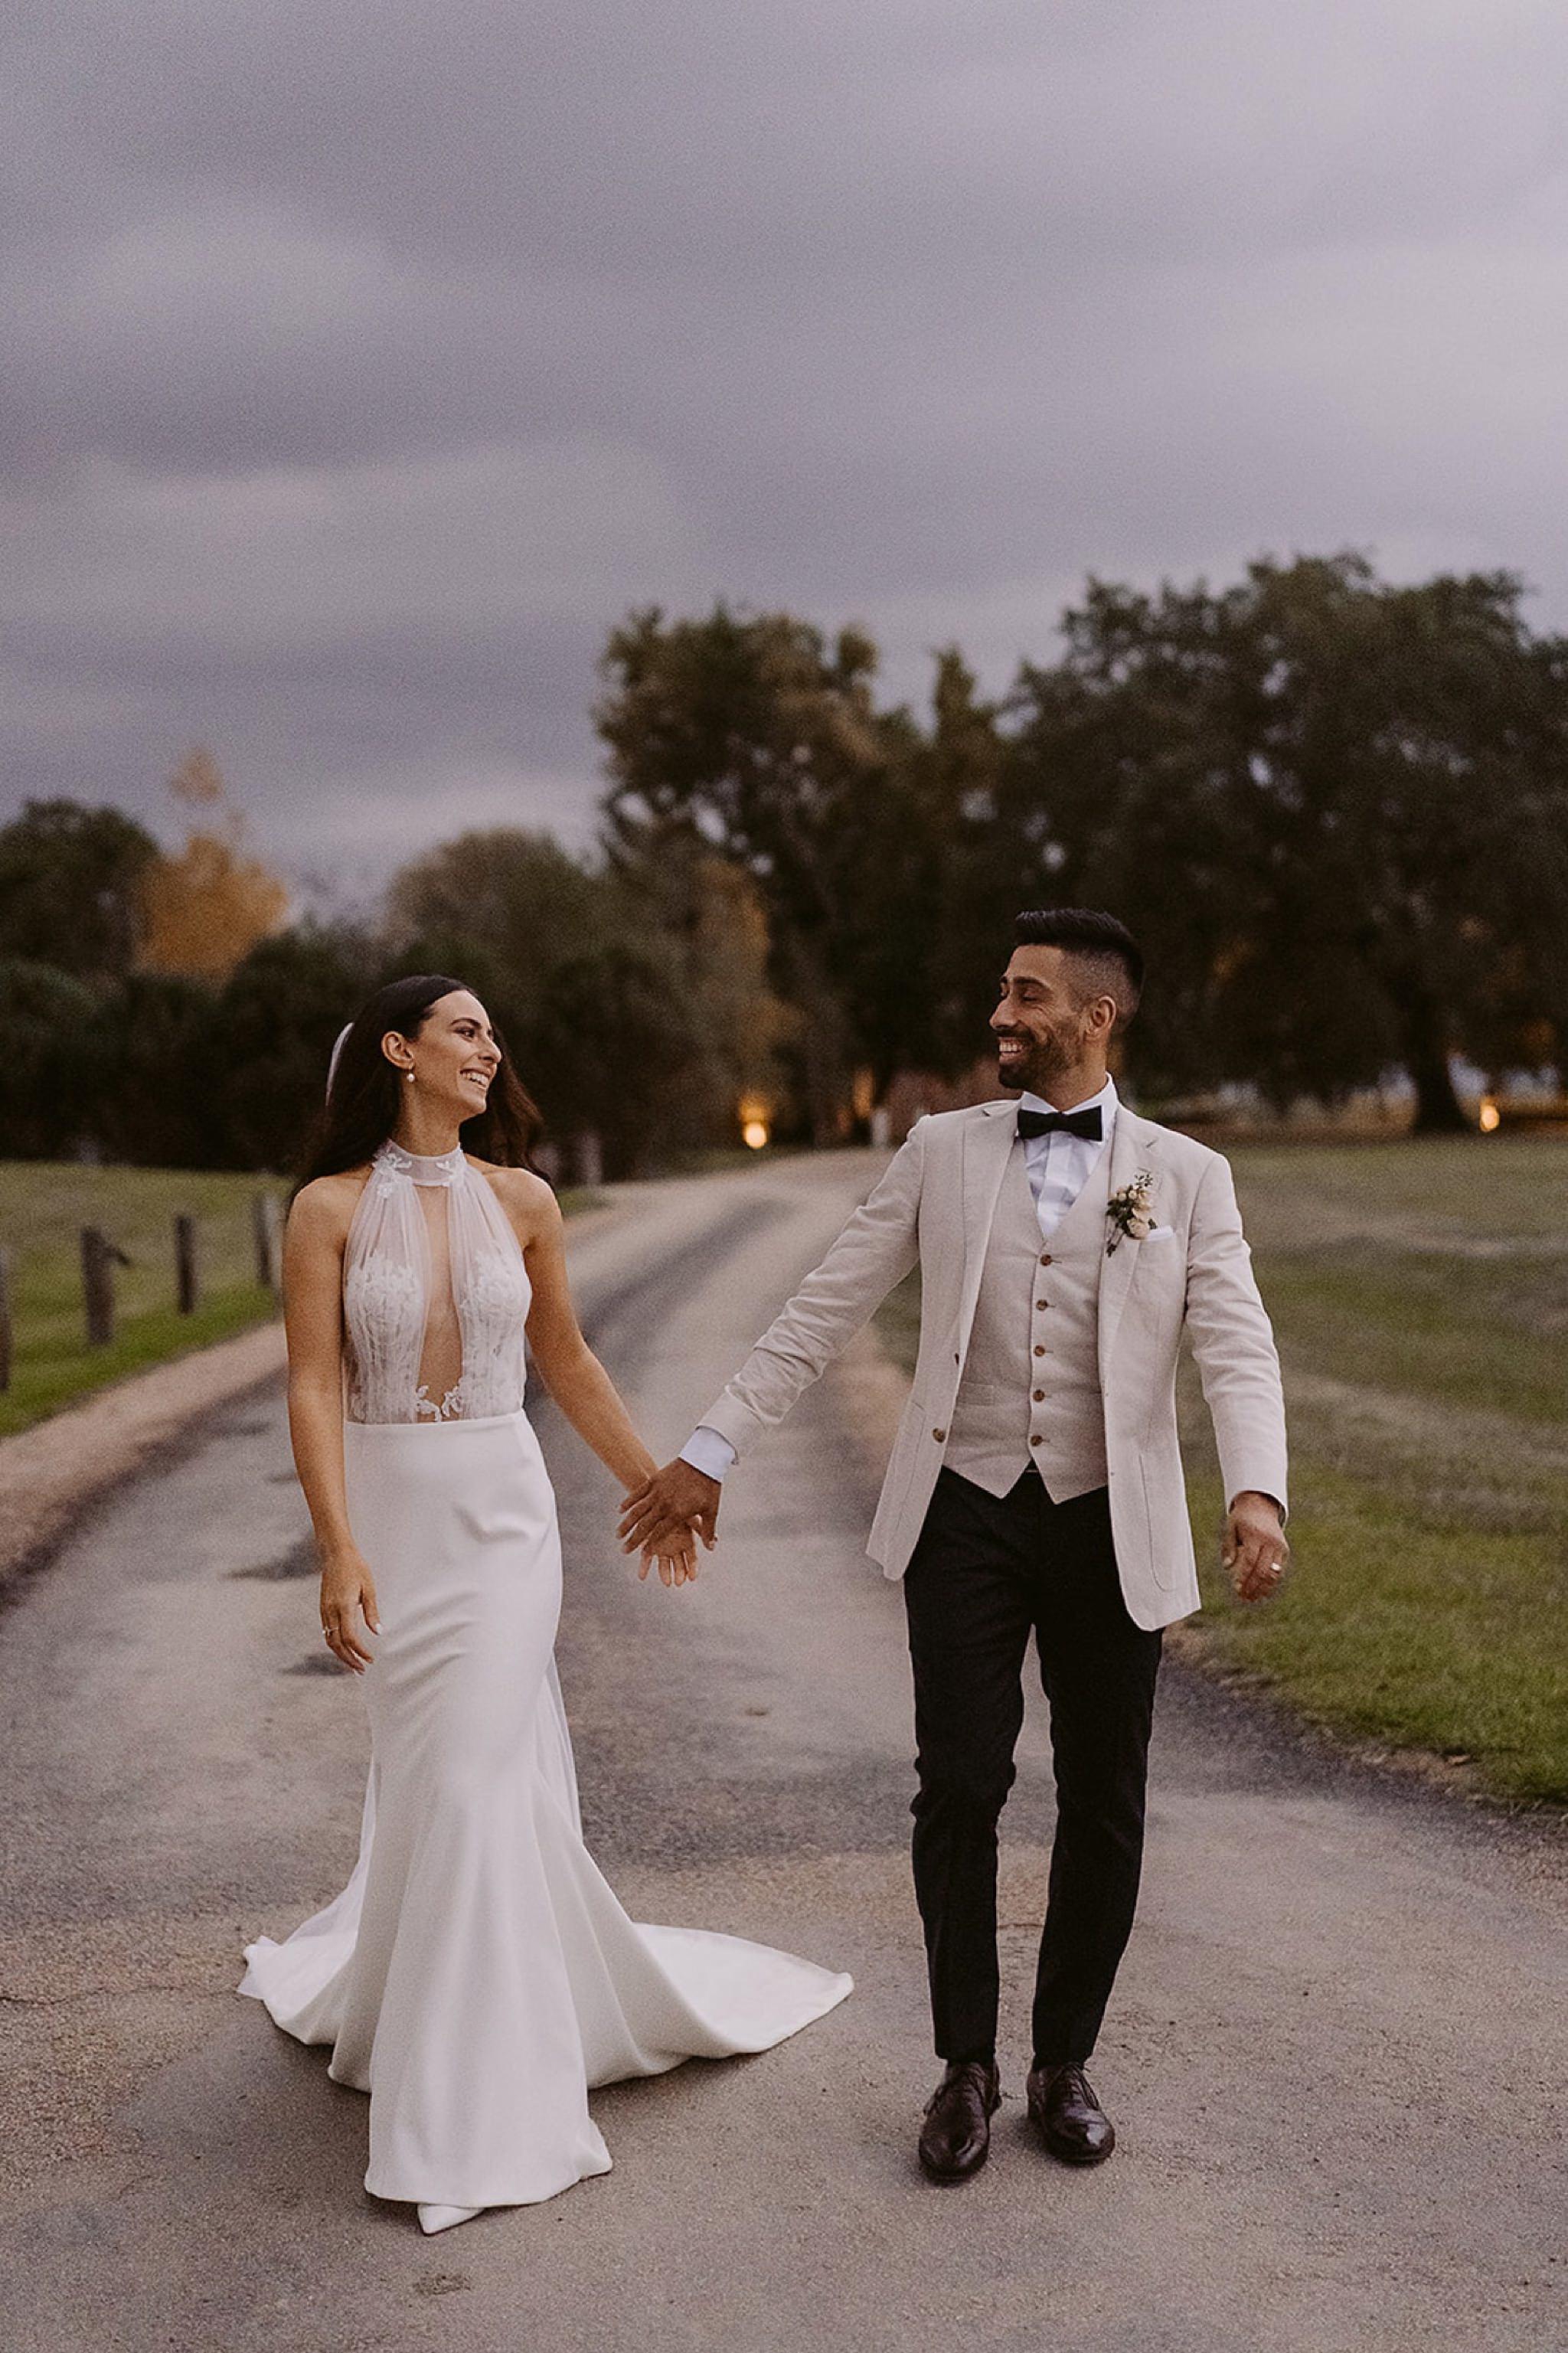 Stones of the Yarra Valley wedding photographer Ashleigh haase107.jpg